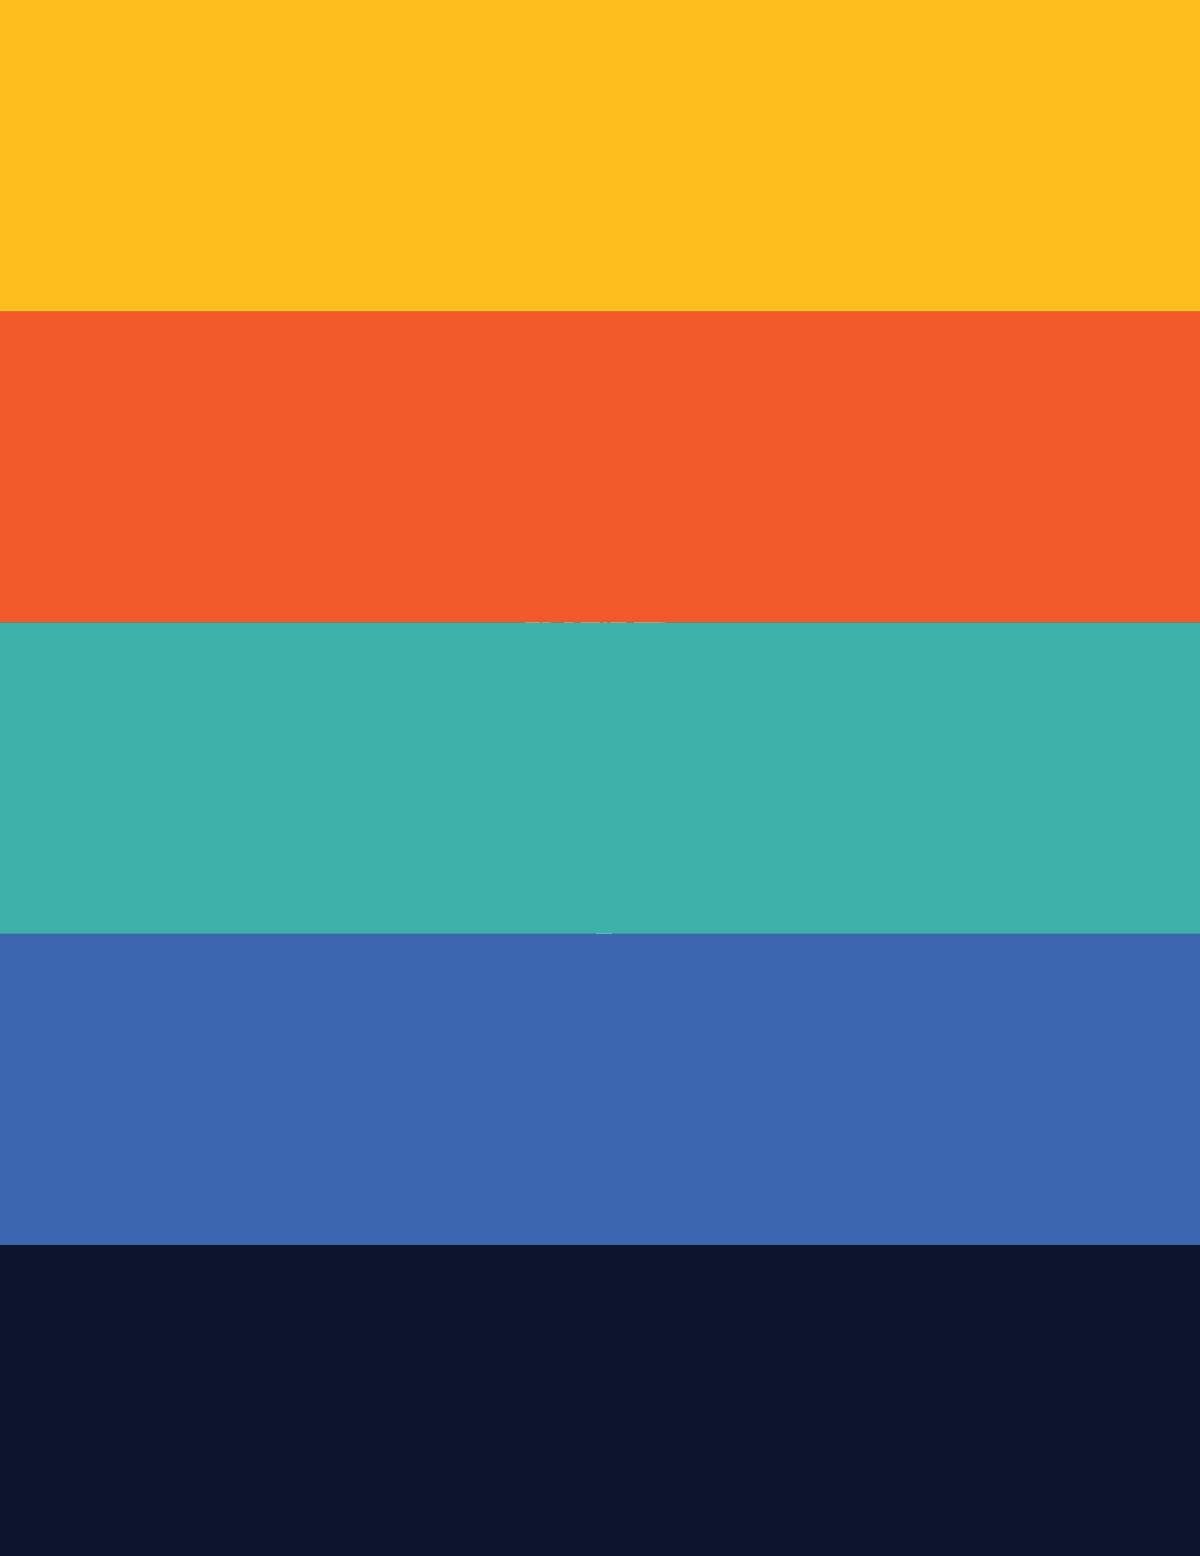 Kids Ocean Day Colors